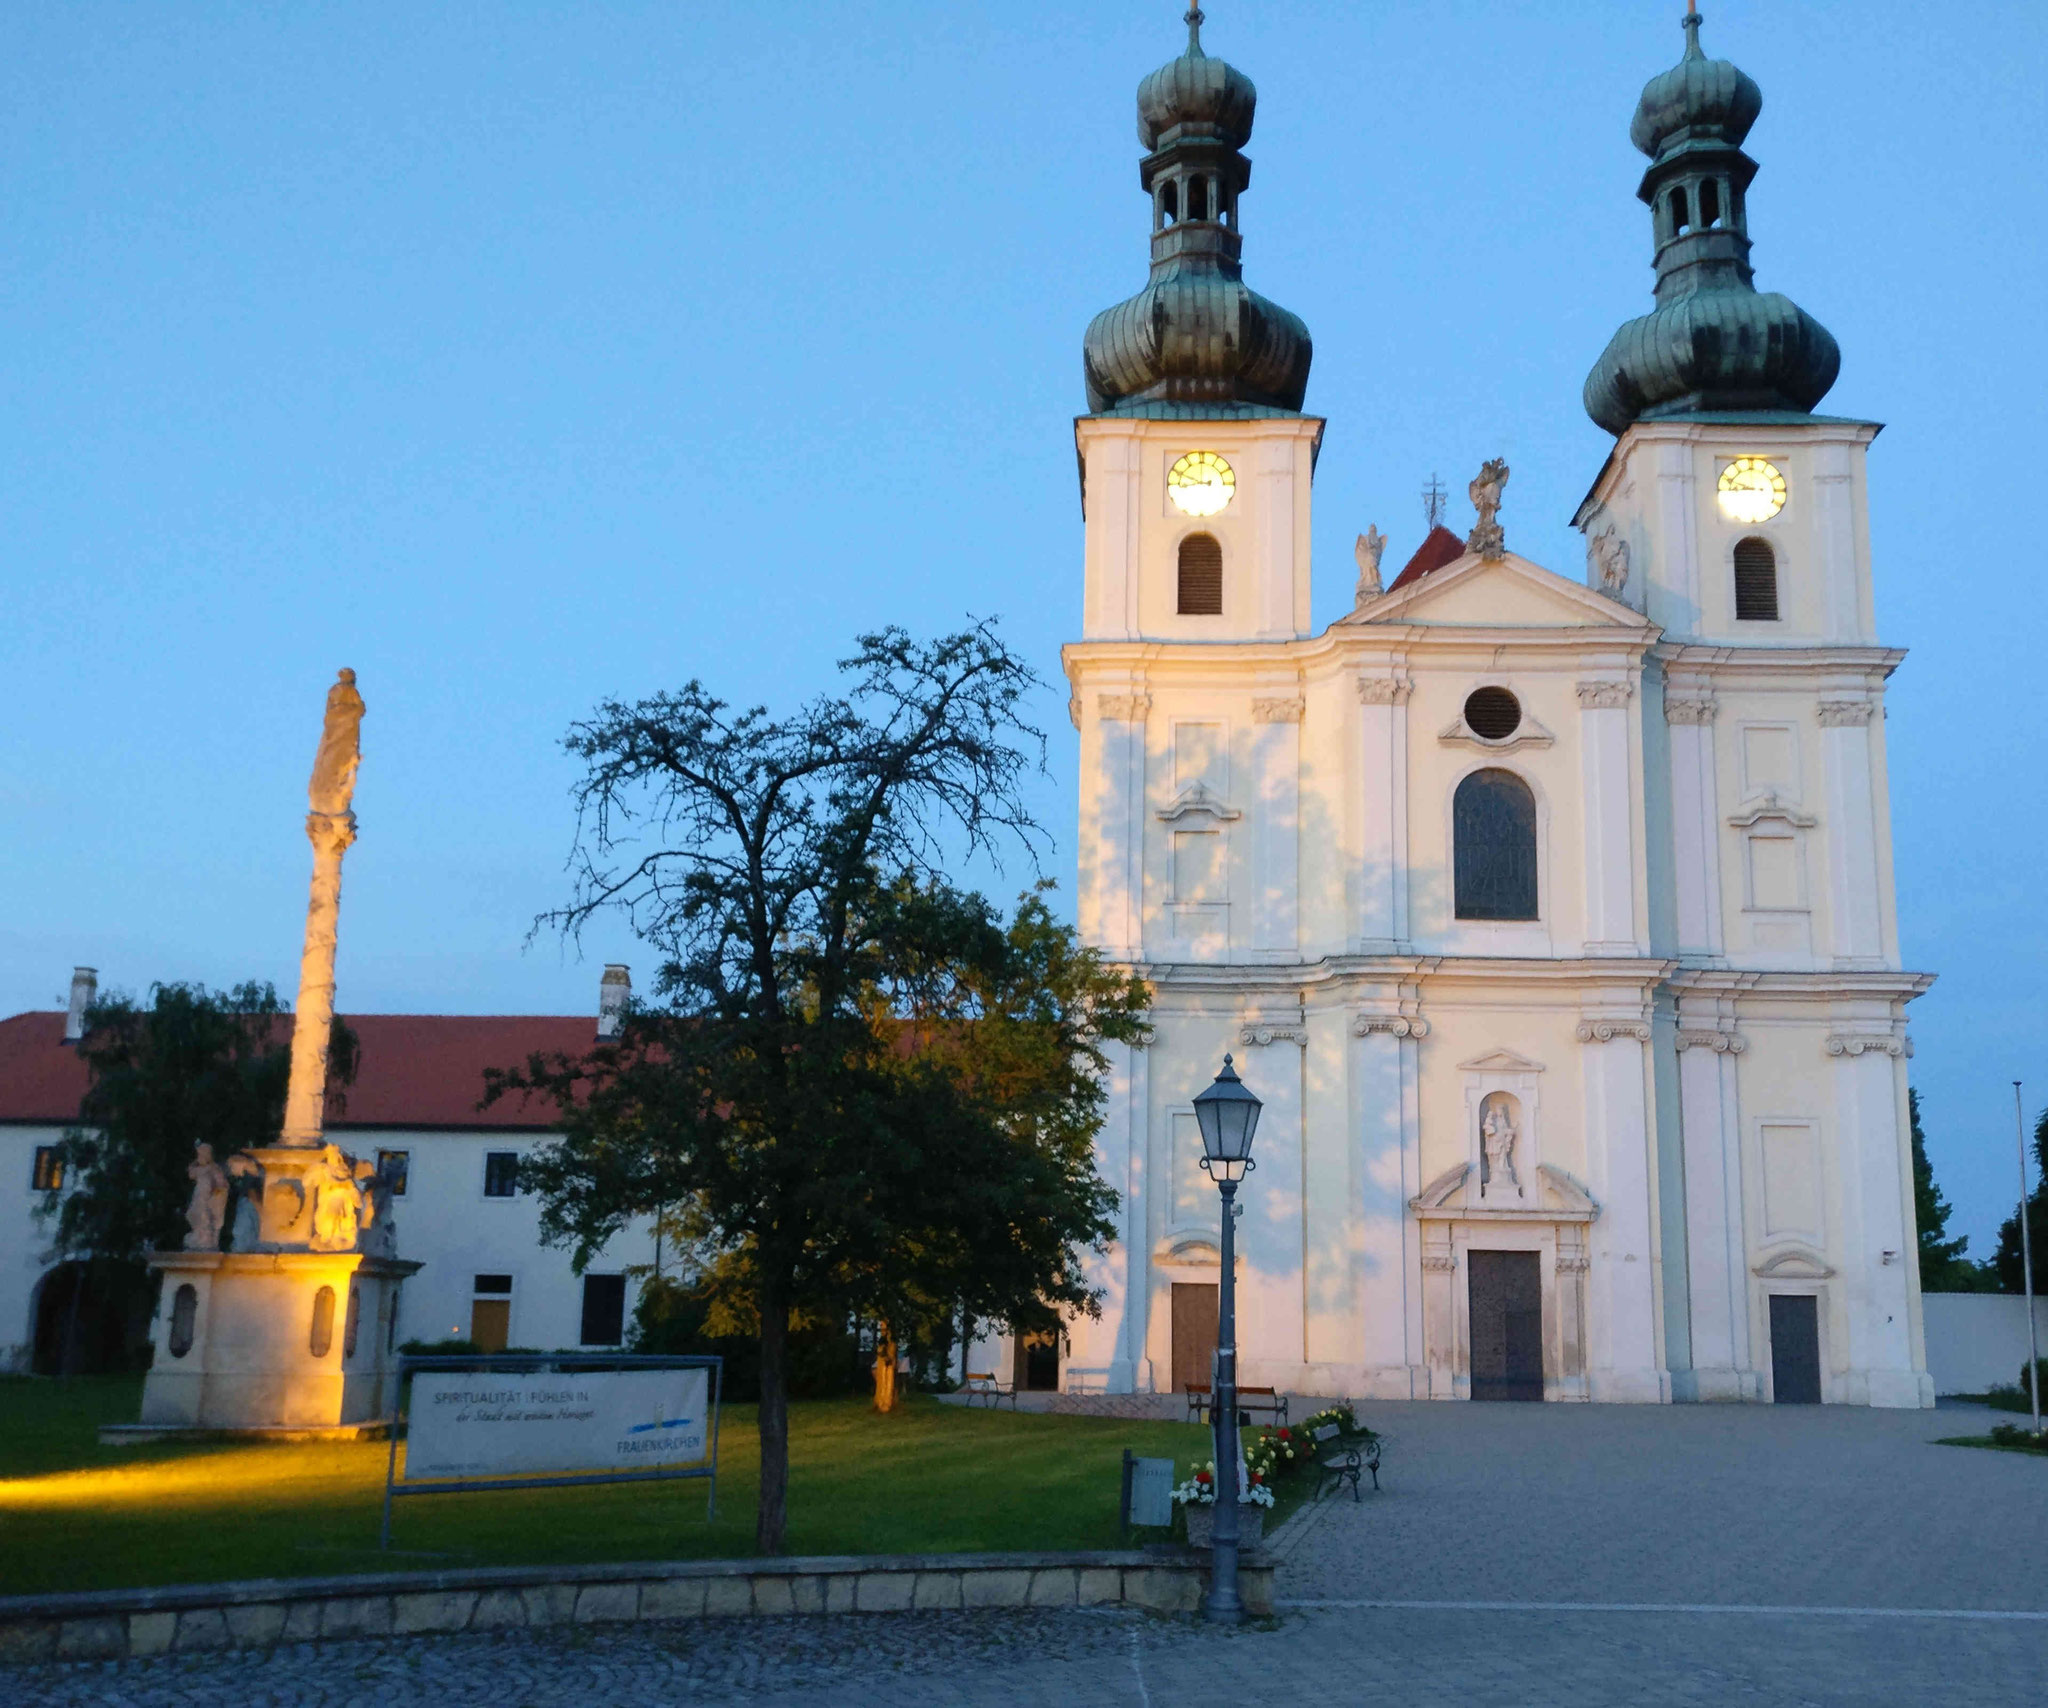 Kirche in Frauenkirchen am Abend